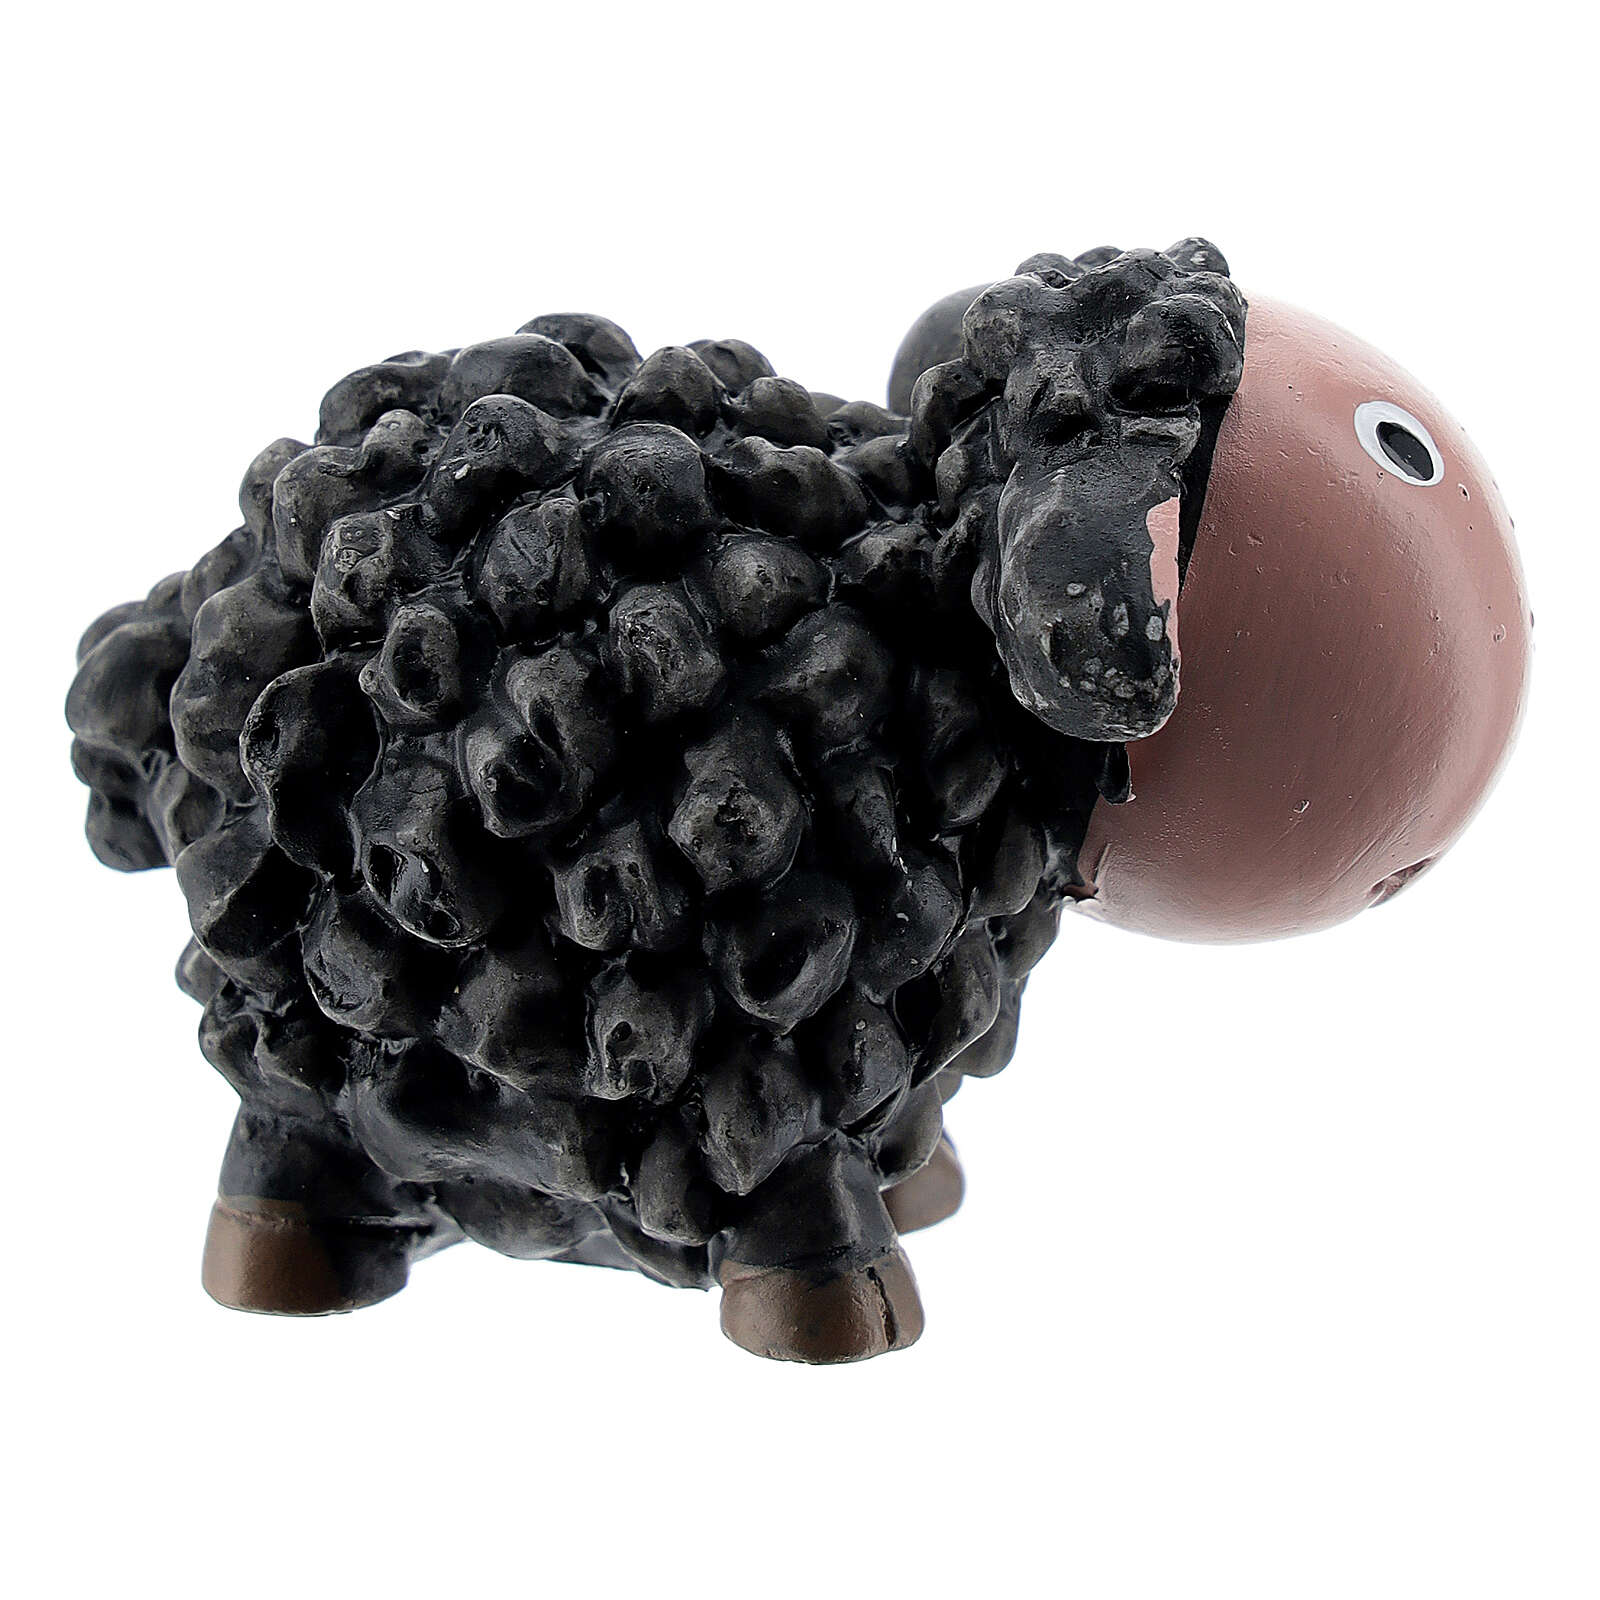 Sheep with black coat 4 cm resin for Nativity scene 8 cm children's line 3